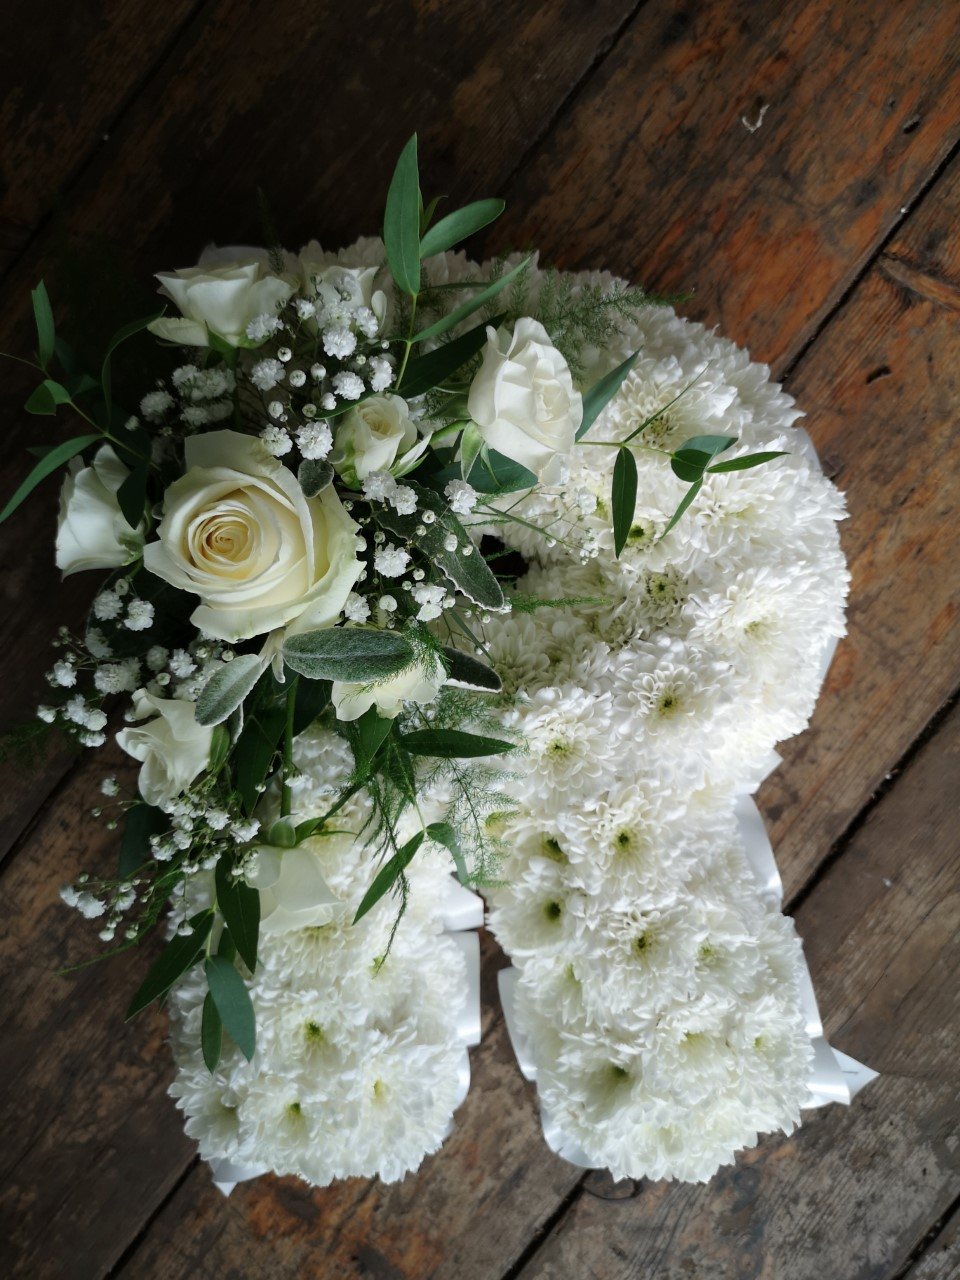 Funeral Flowers White Single Letter £45 Each